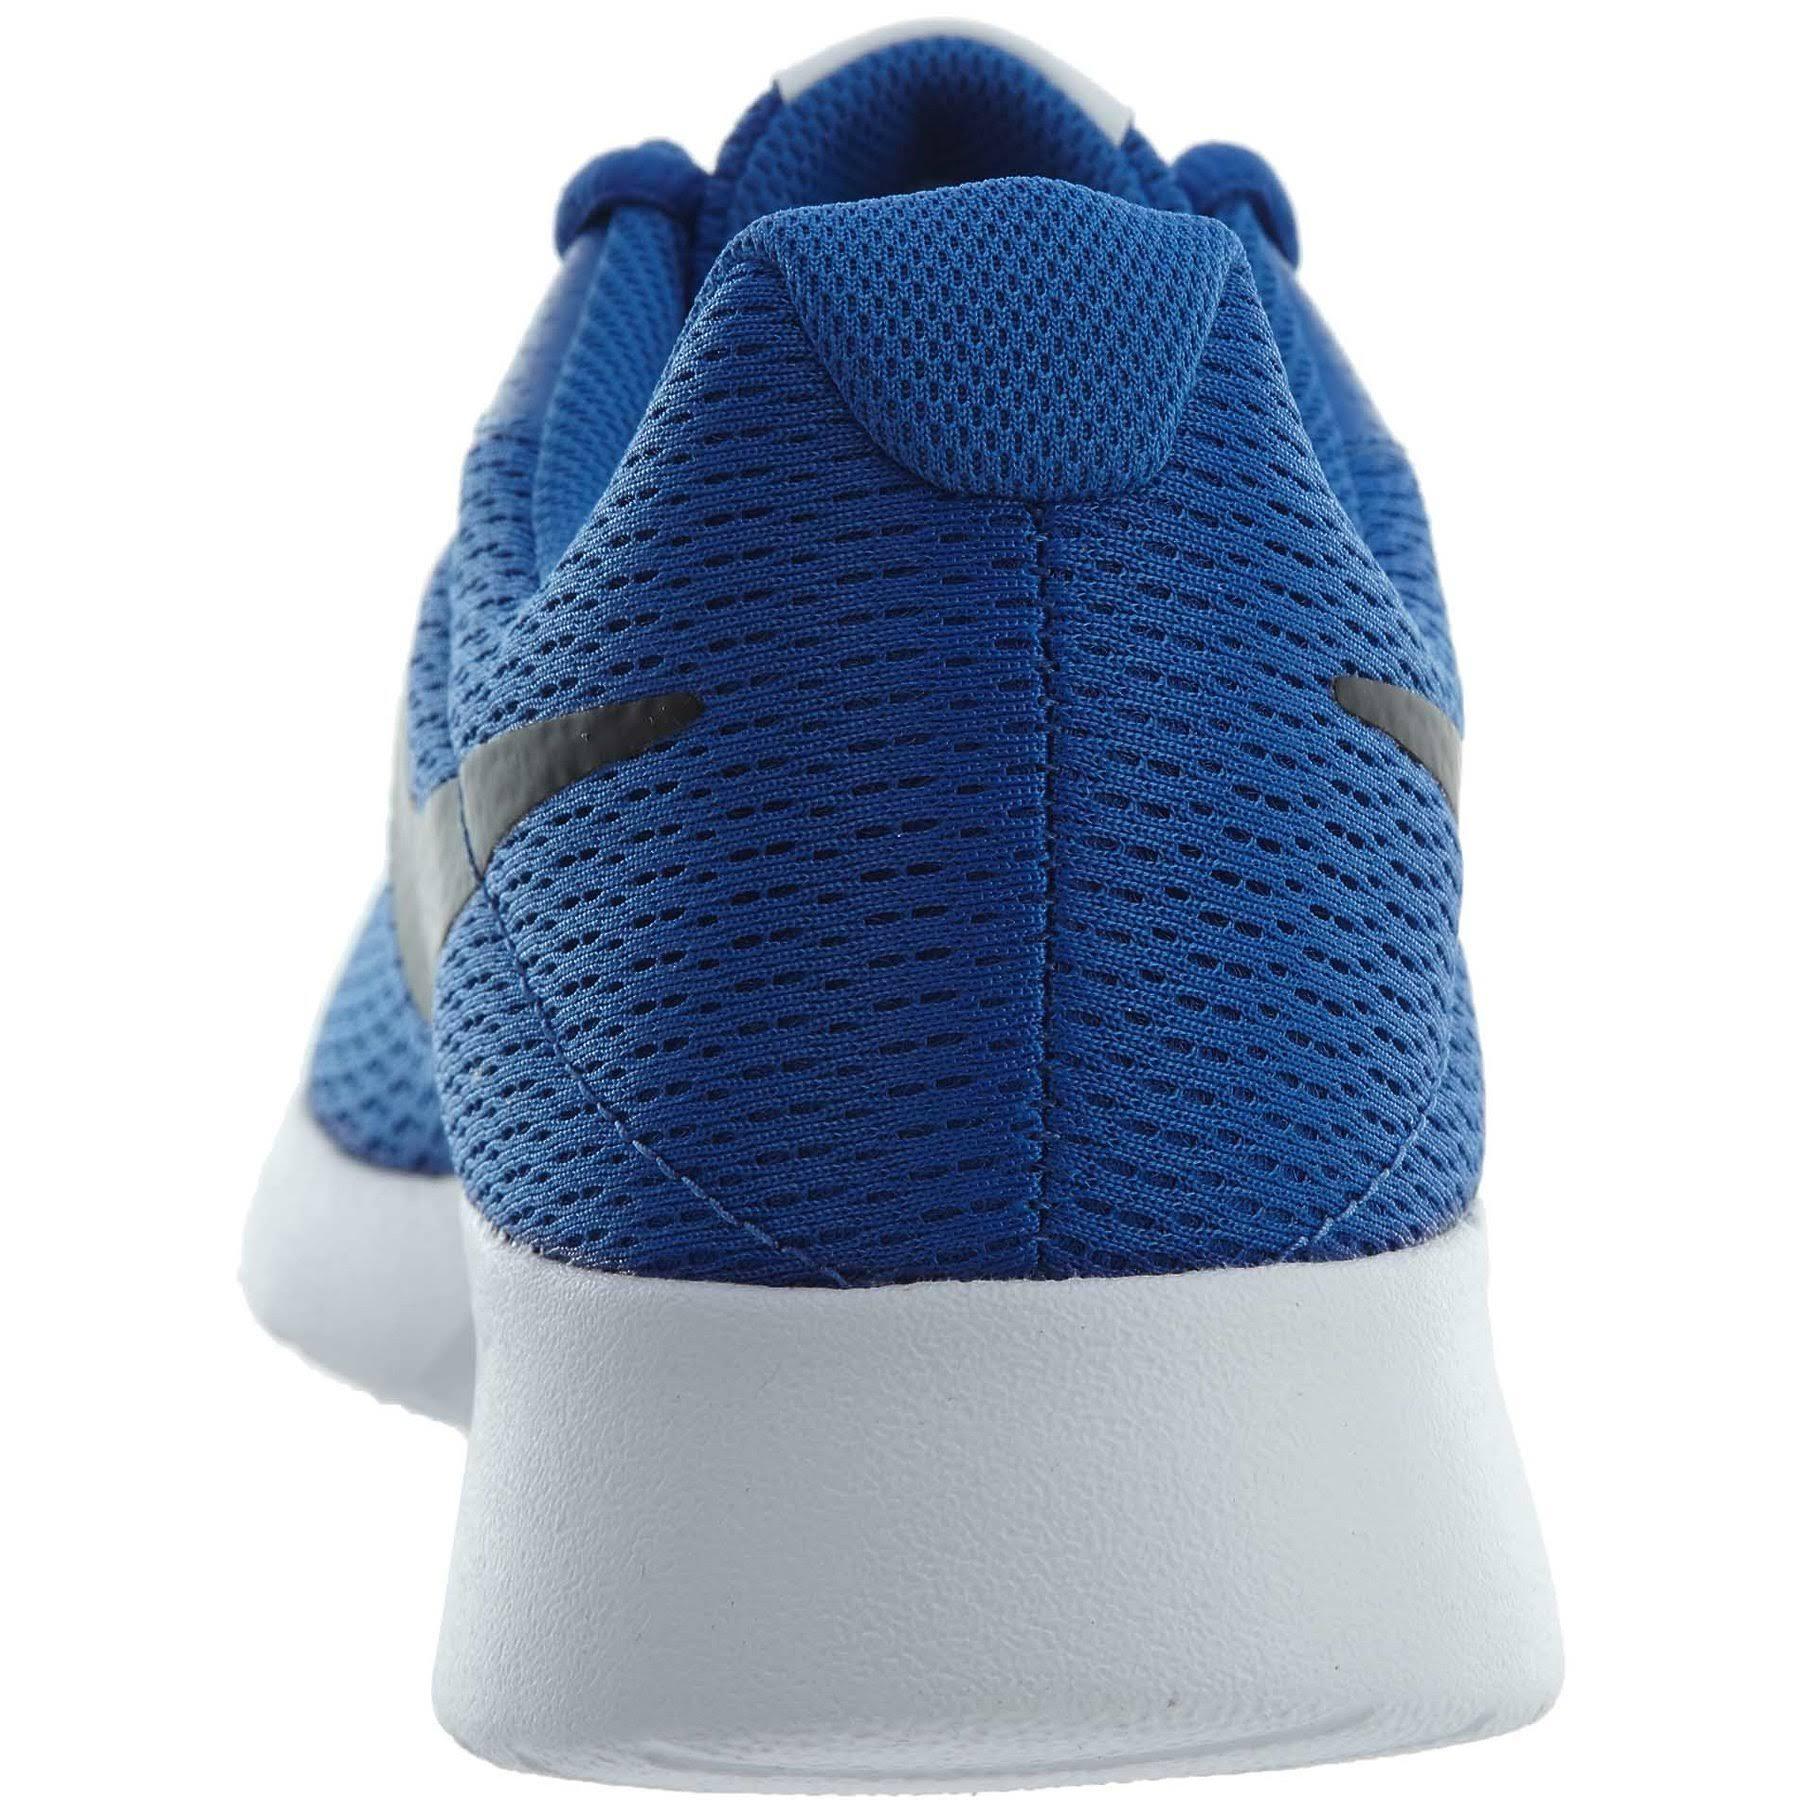 Nike Tanjun Mens Nike RoyalNero Mens Tanjun Nike RoyalNero QChrdtsx